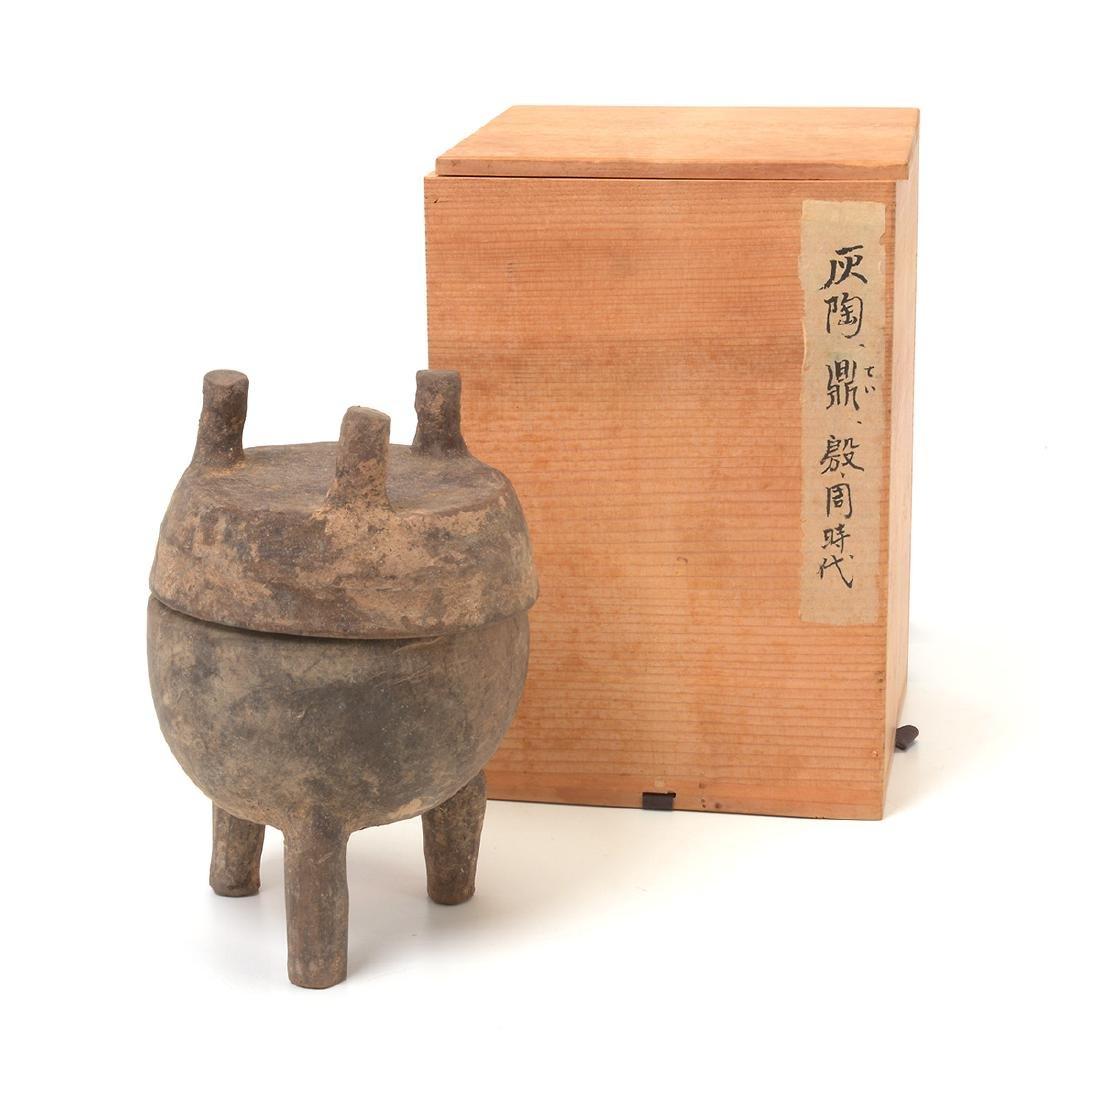 Pottery Tripod Vessel and Lid, Western Zhou Dynasty